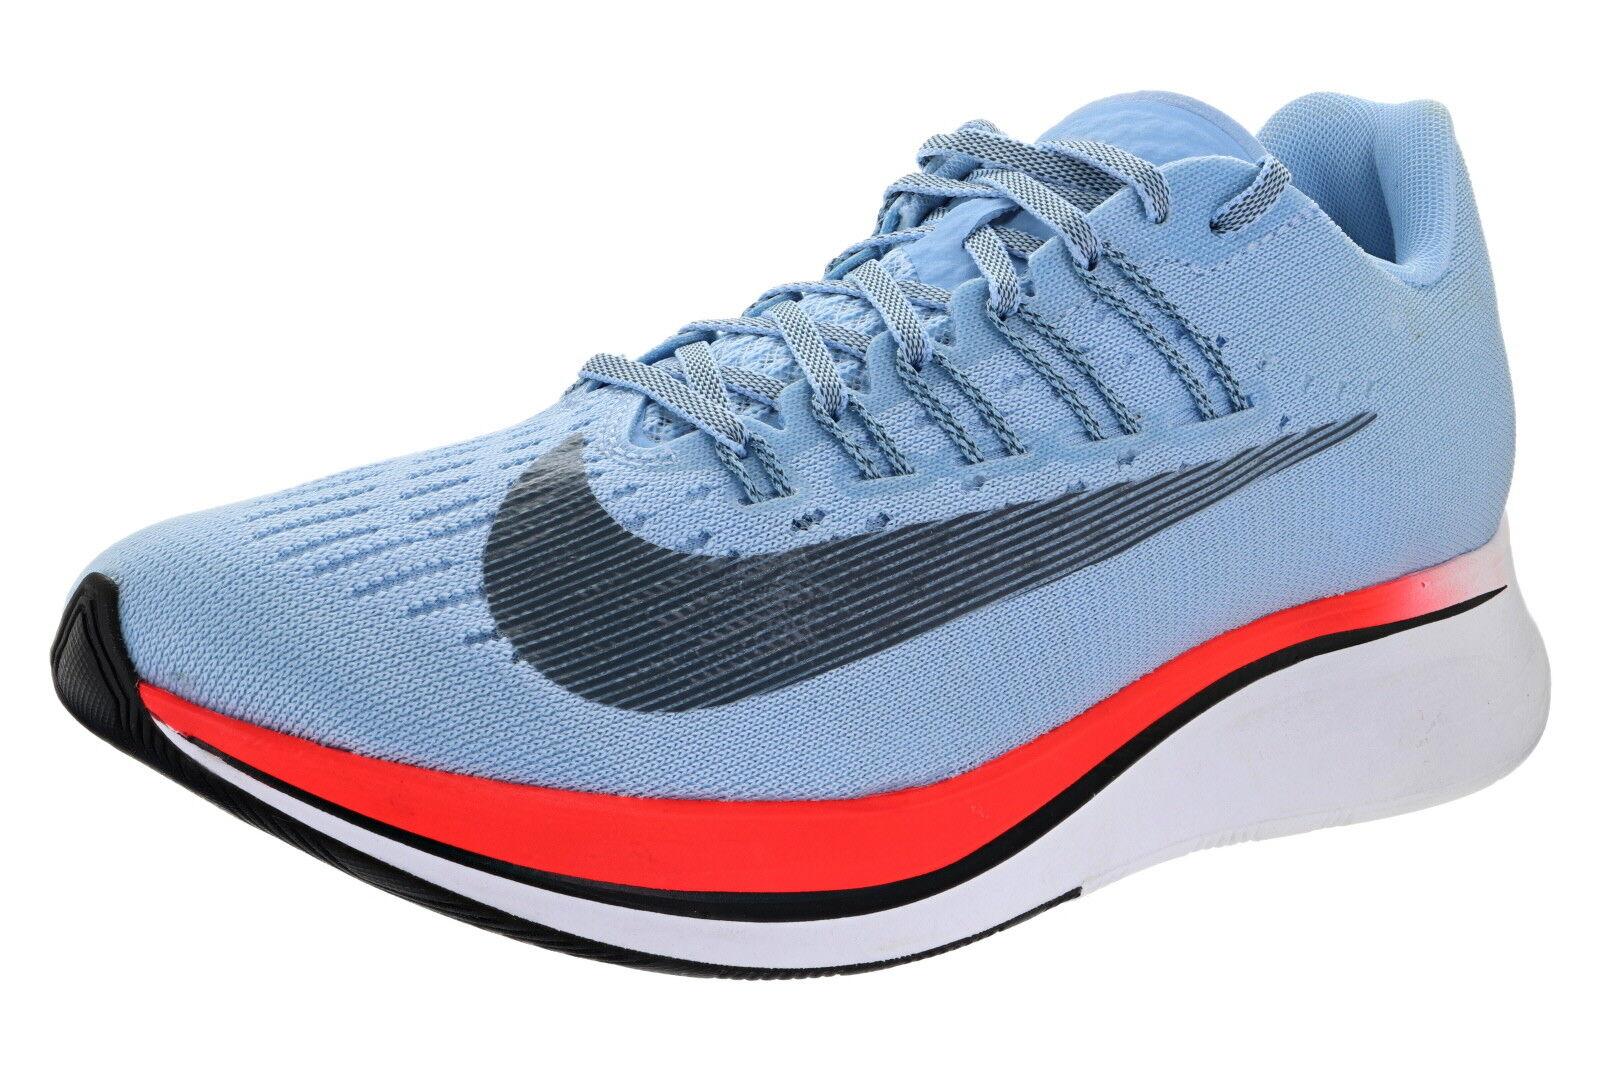 Nike Zoom Fly Womens Medium Width Athletic Running Training Shoes 897821-401